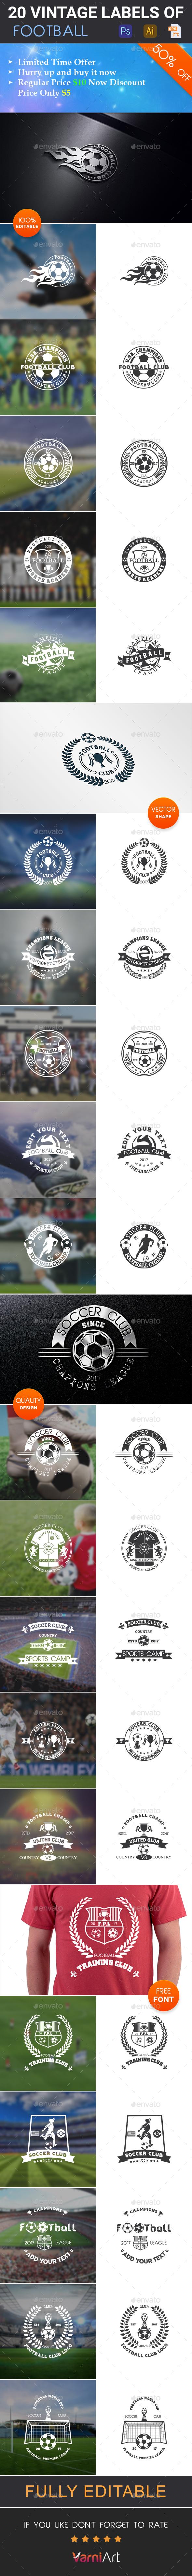 20 Football Club Vintage Labels - Badges & Stickers Web Elements